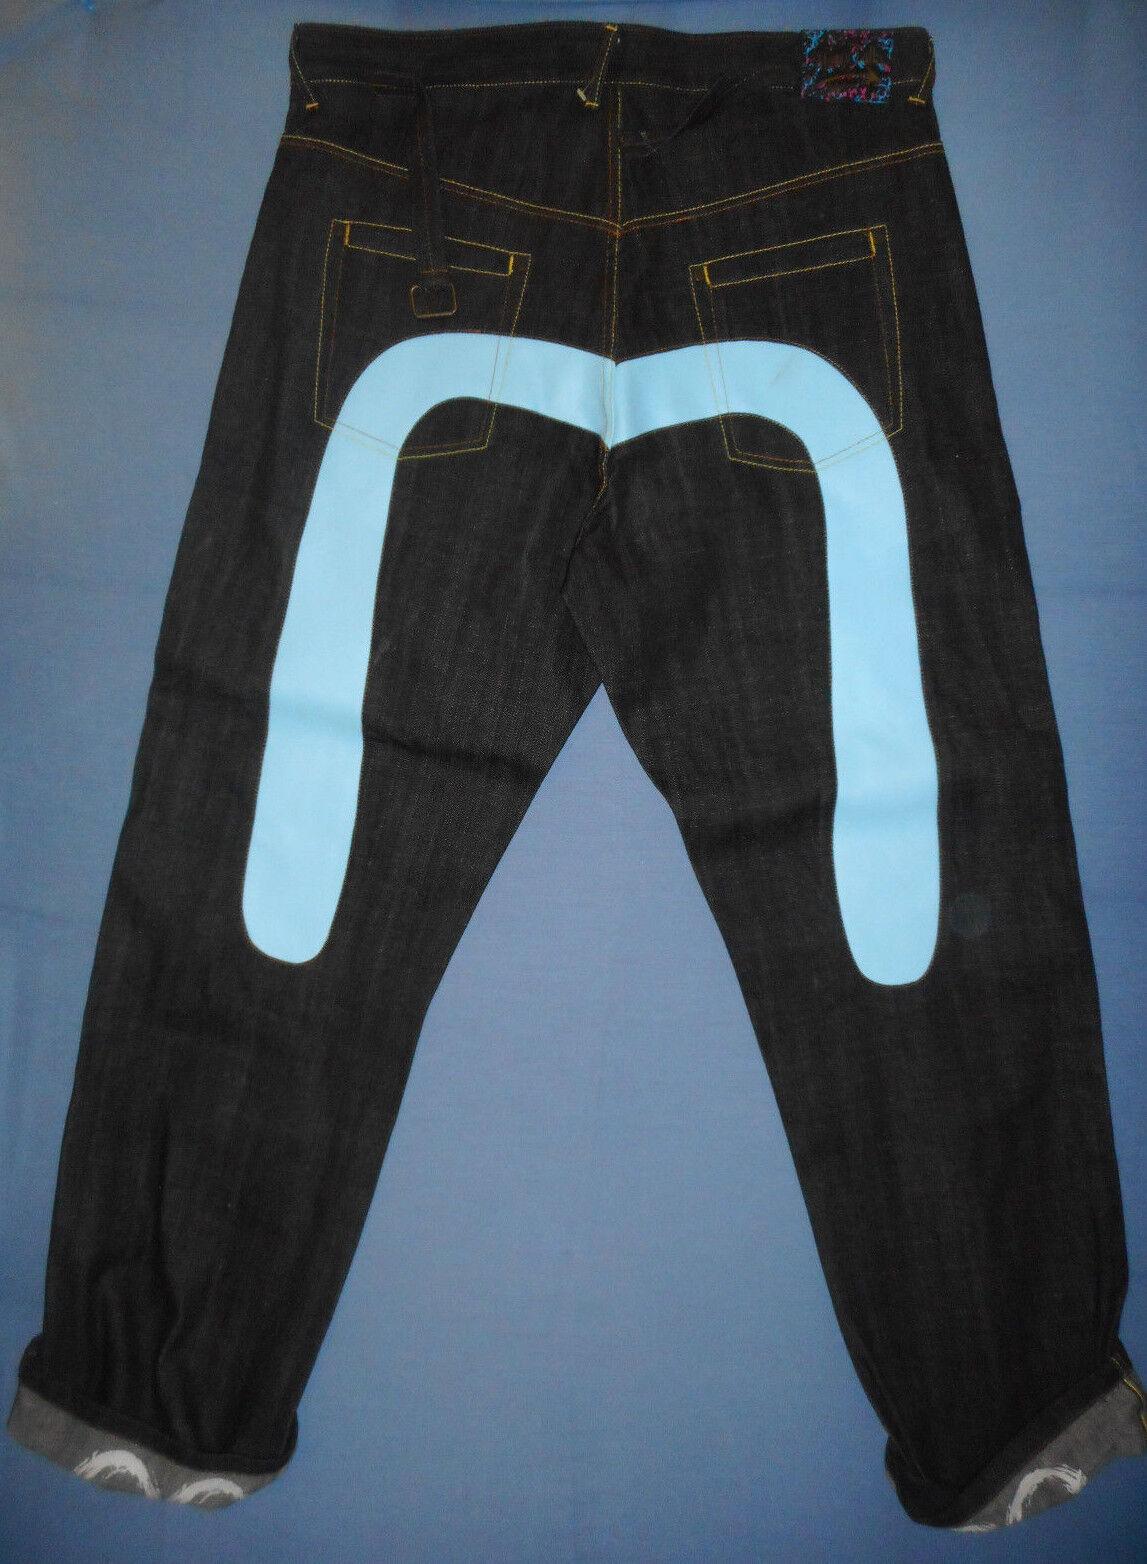 NEW Genuine MONEY TALKS - W40 Mens Dark Blau Hip Hop Jeans - Cinch Zip Fly -G932